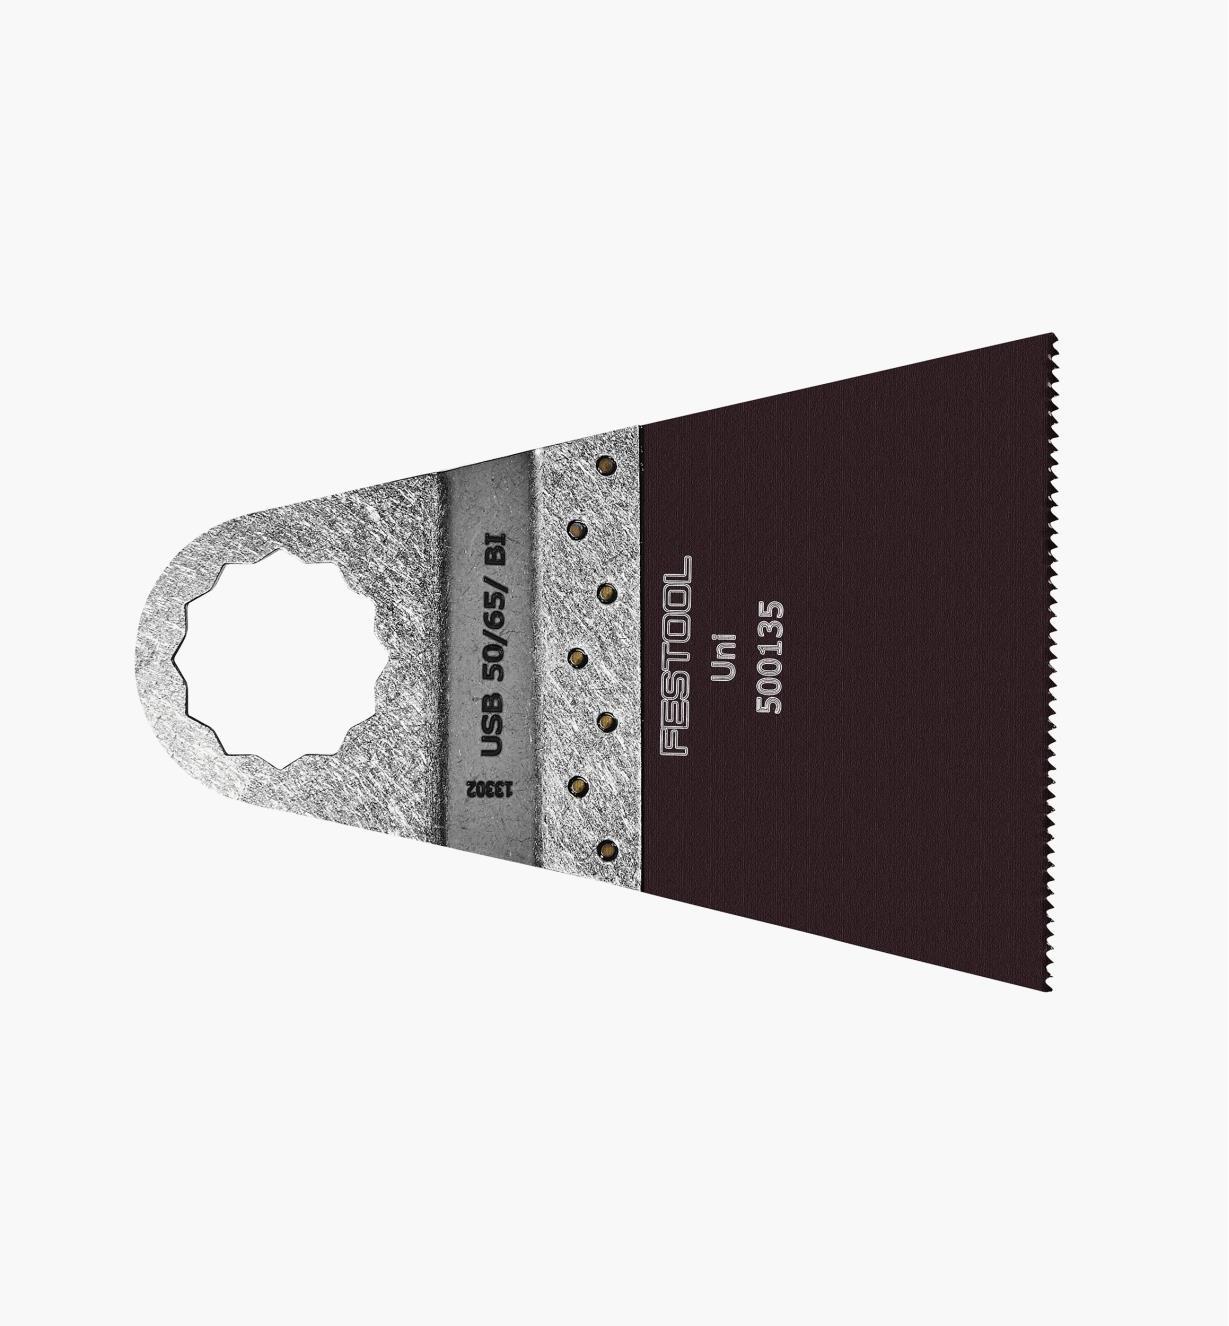 ZA500149 - 50/65/BI Universal Blade, Qty. 5